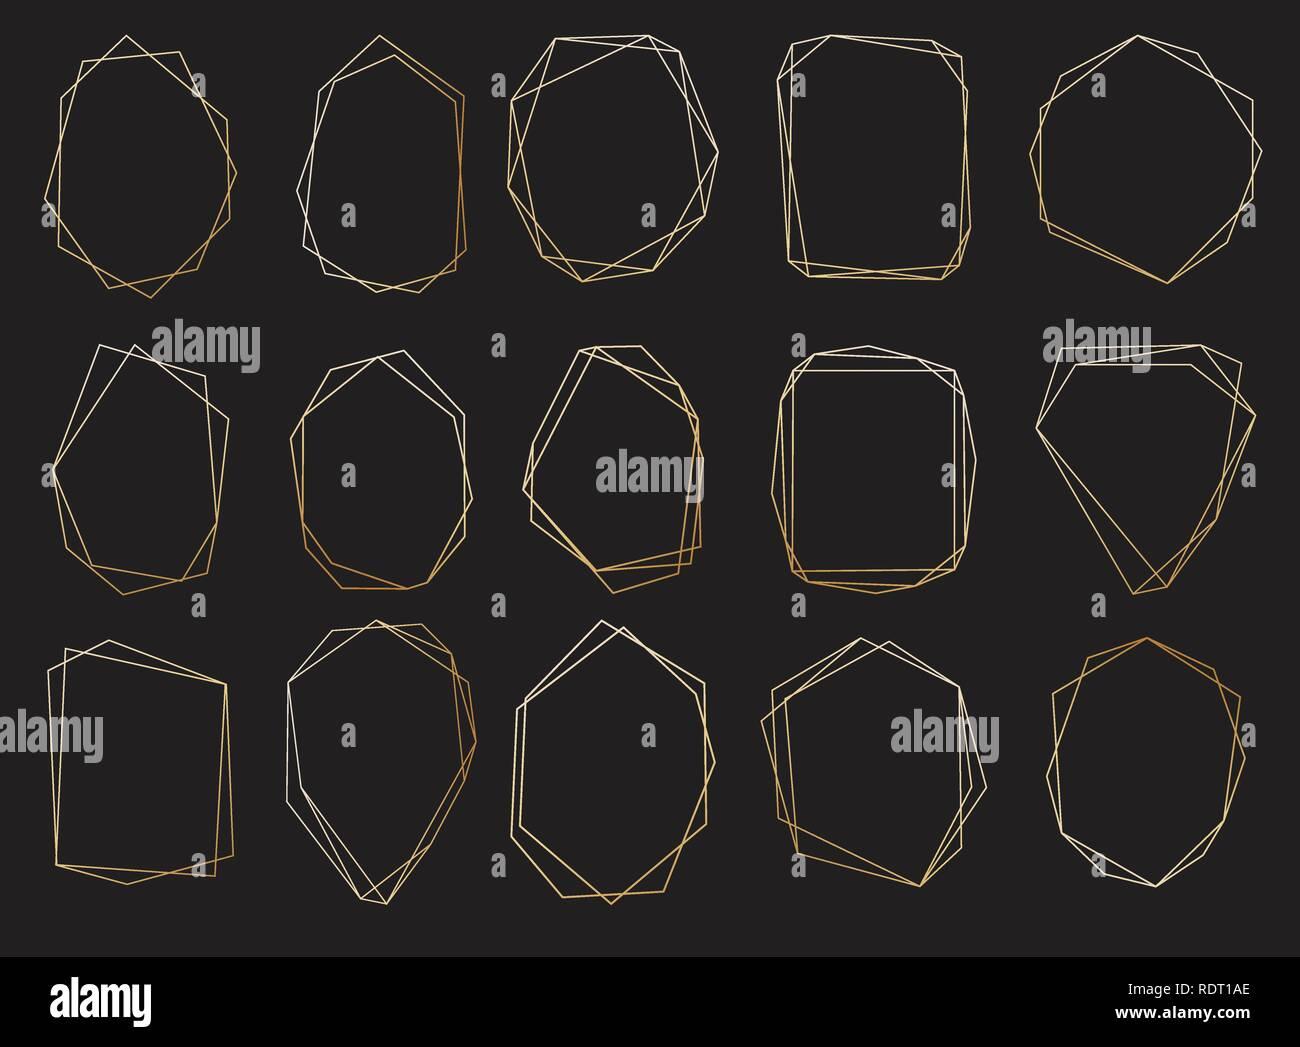 Polygonal frames set. Gold triangles, geometric shapes. - Stock Image